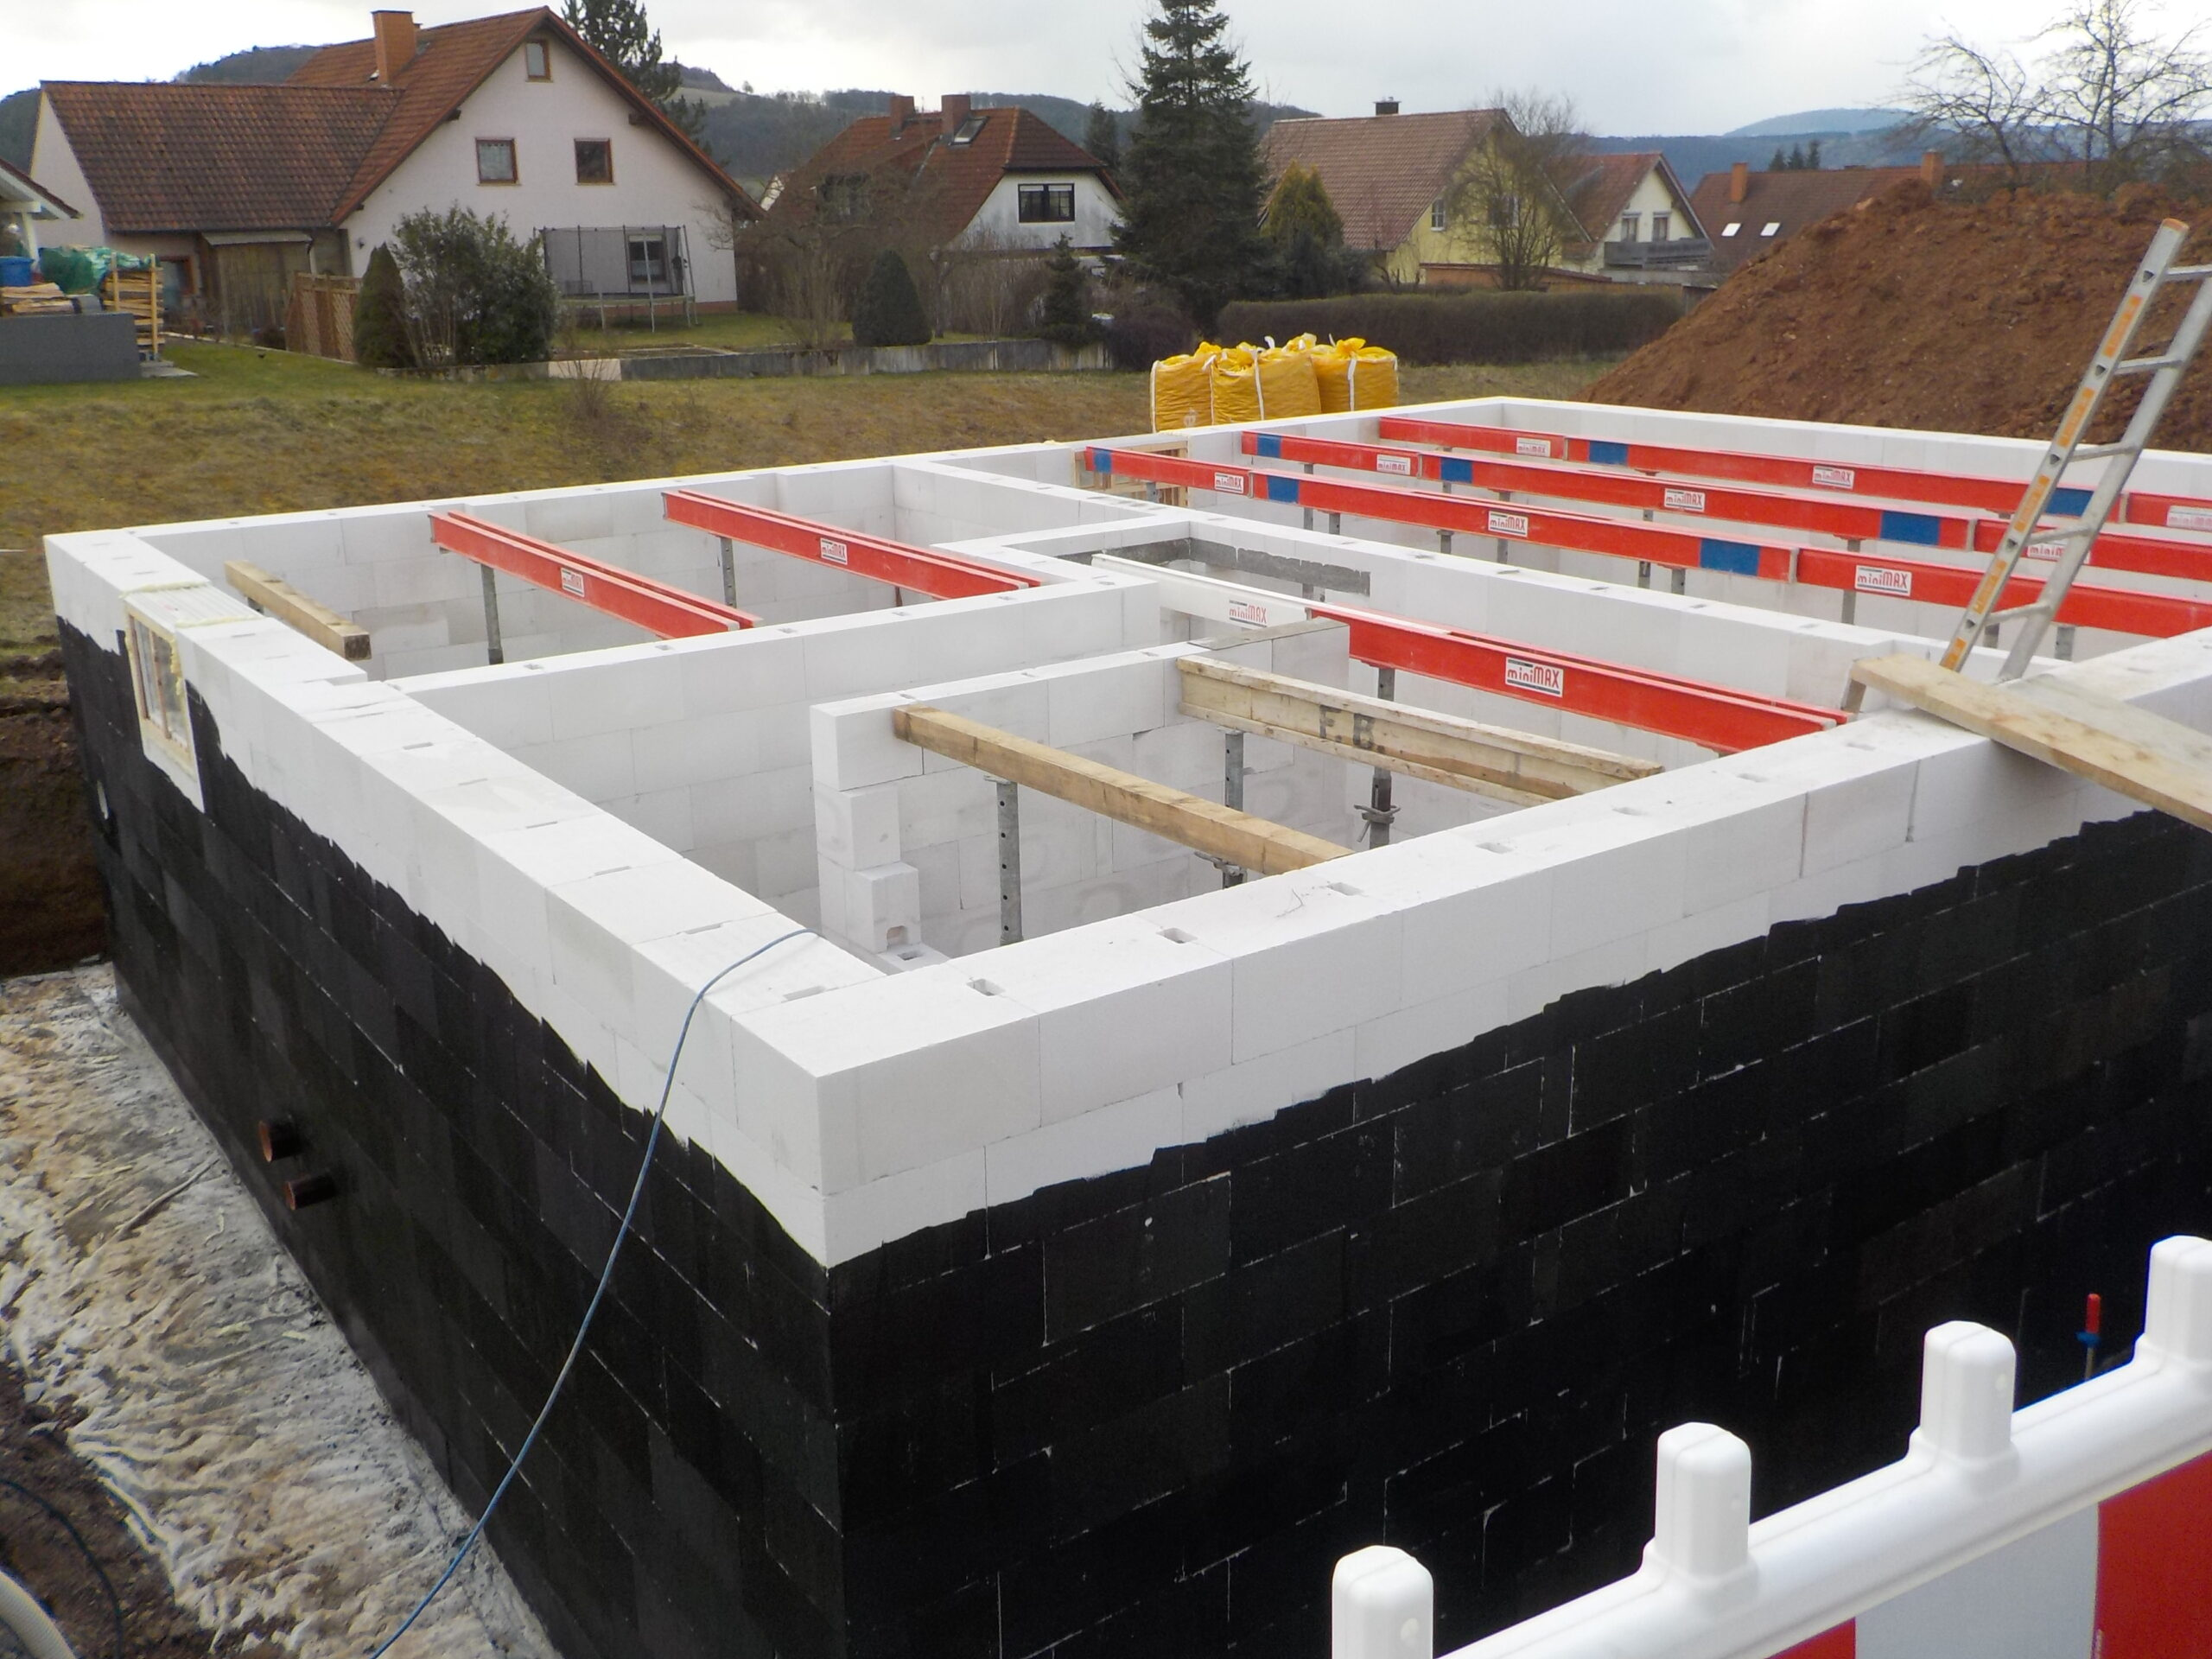 Keller - Am Bendel 1 - Fuchsstadt (1)